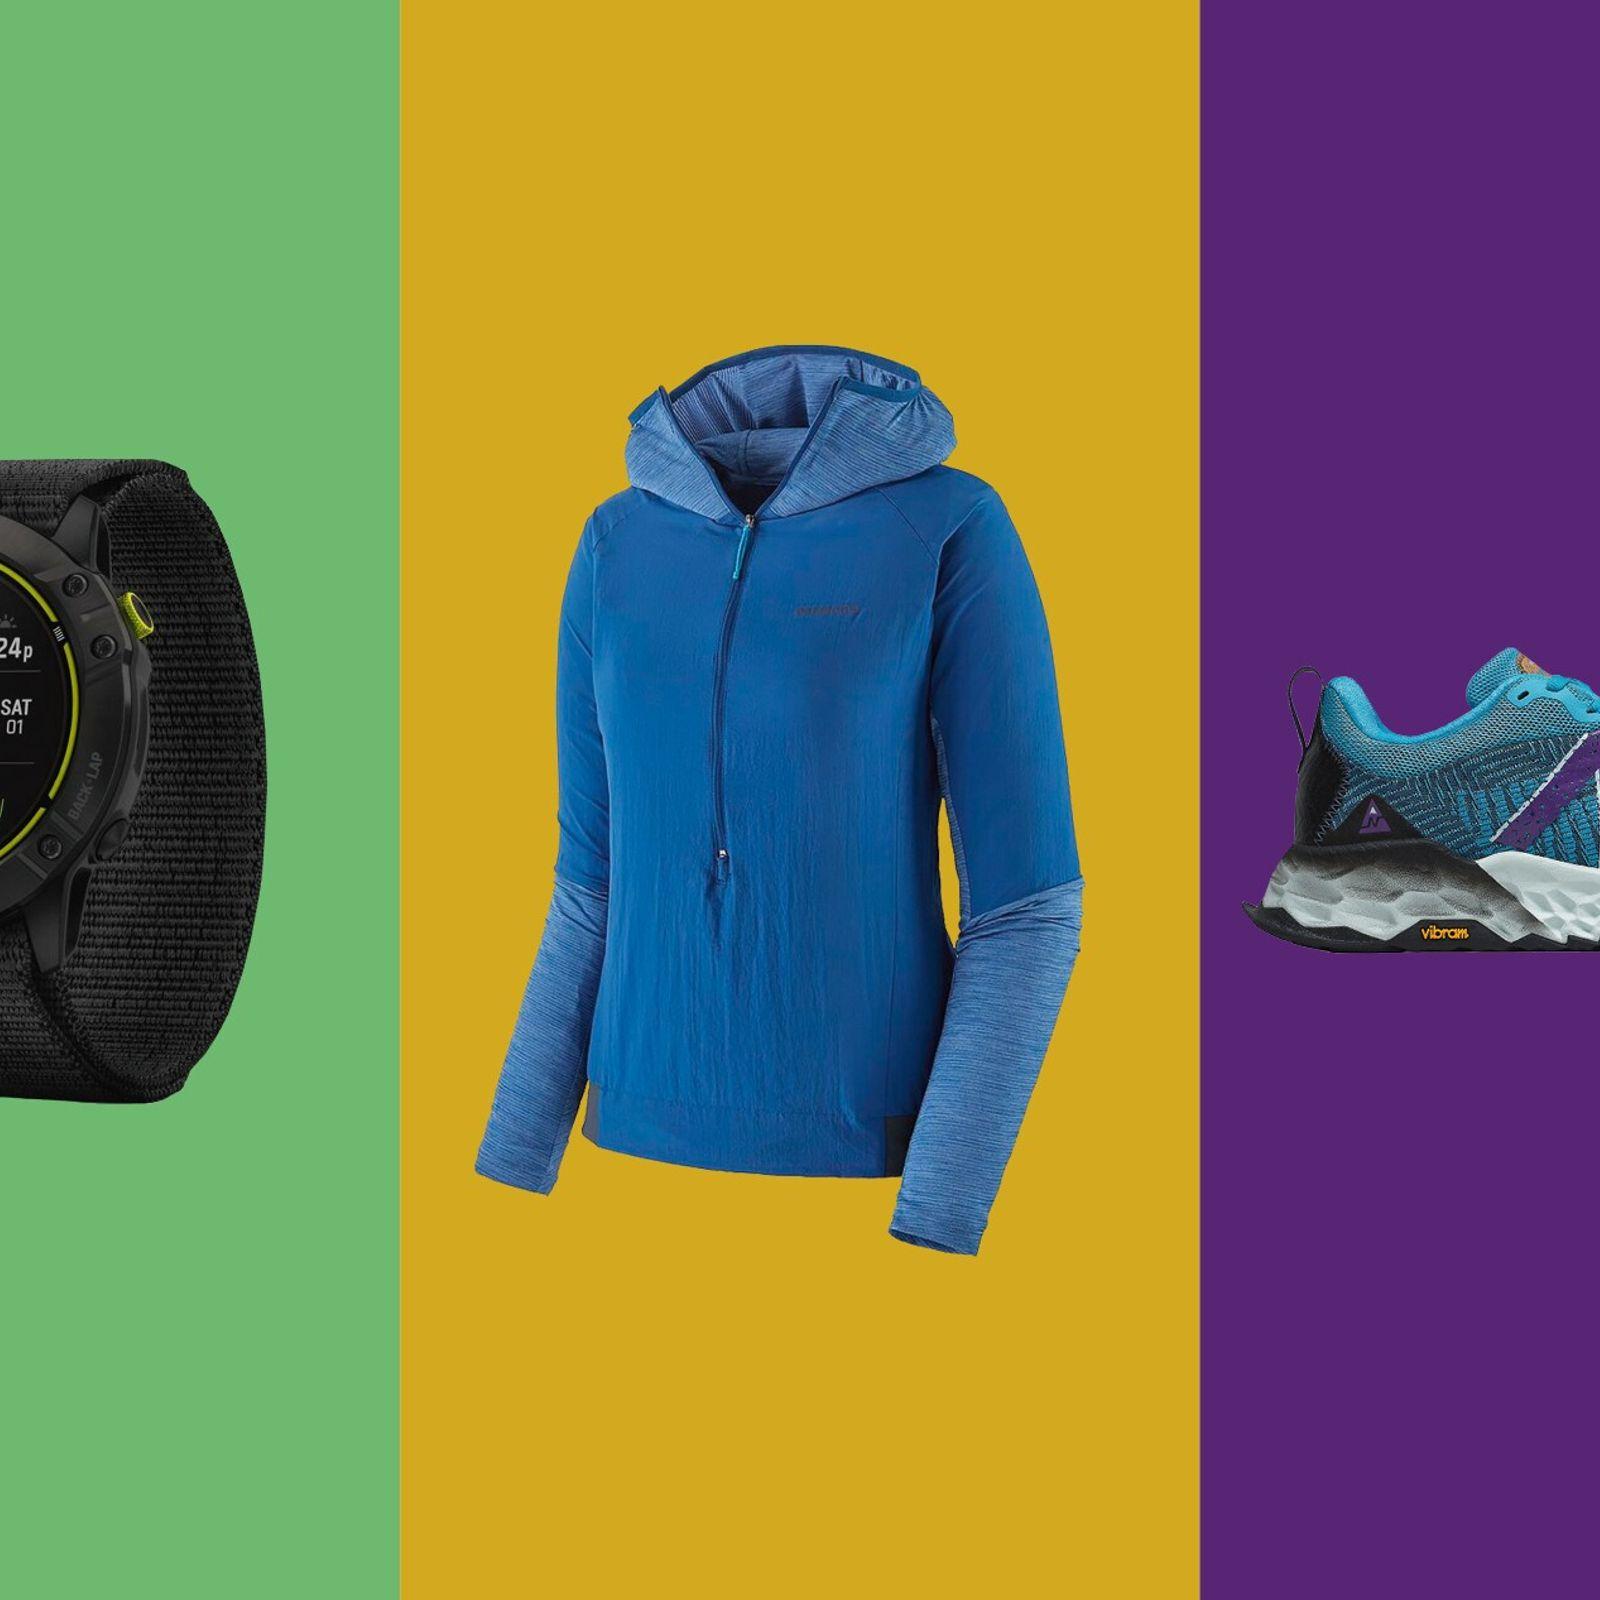 Left to right: Garmin Enduro GPS Multisport Watch, Patagonia Airshed Pro Pullover, New Balance Fresh Foam Hierro v6.